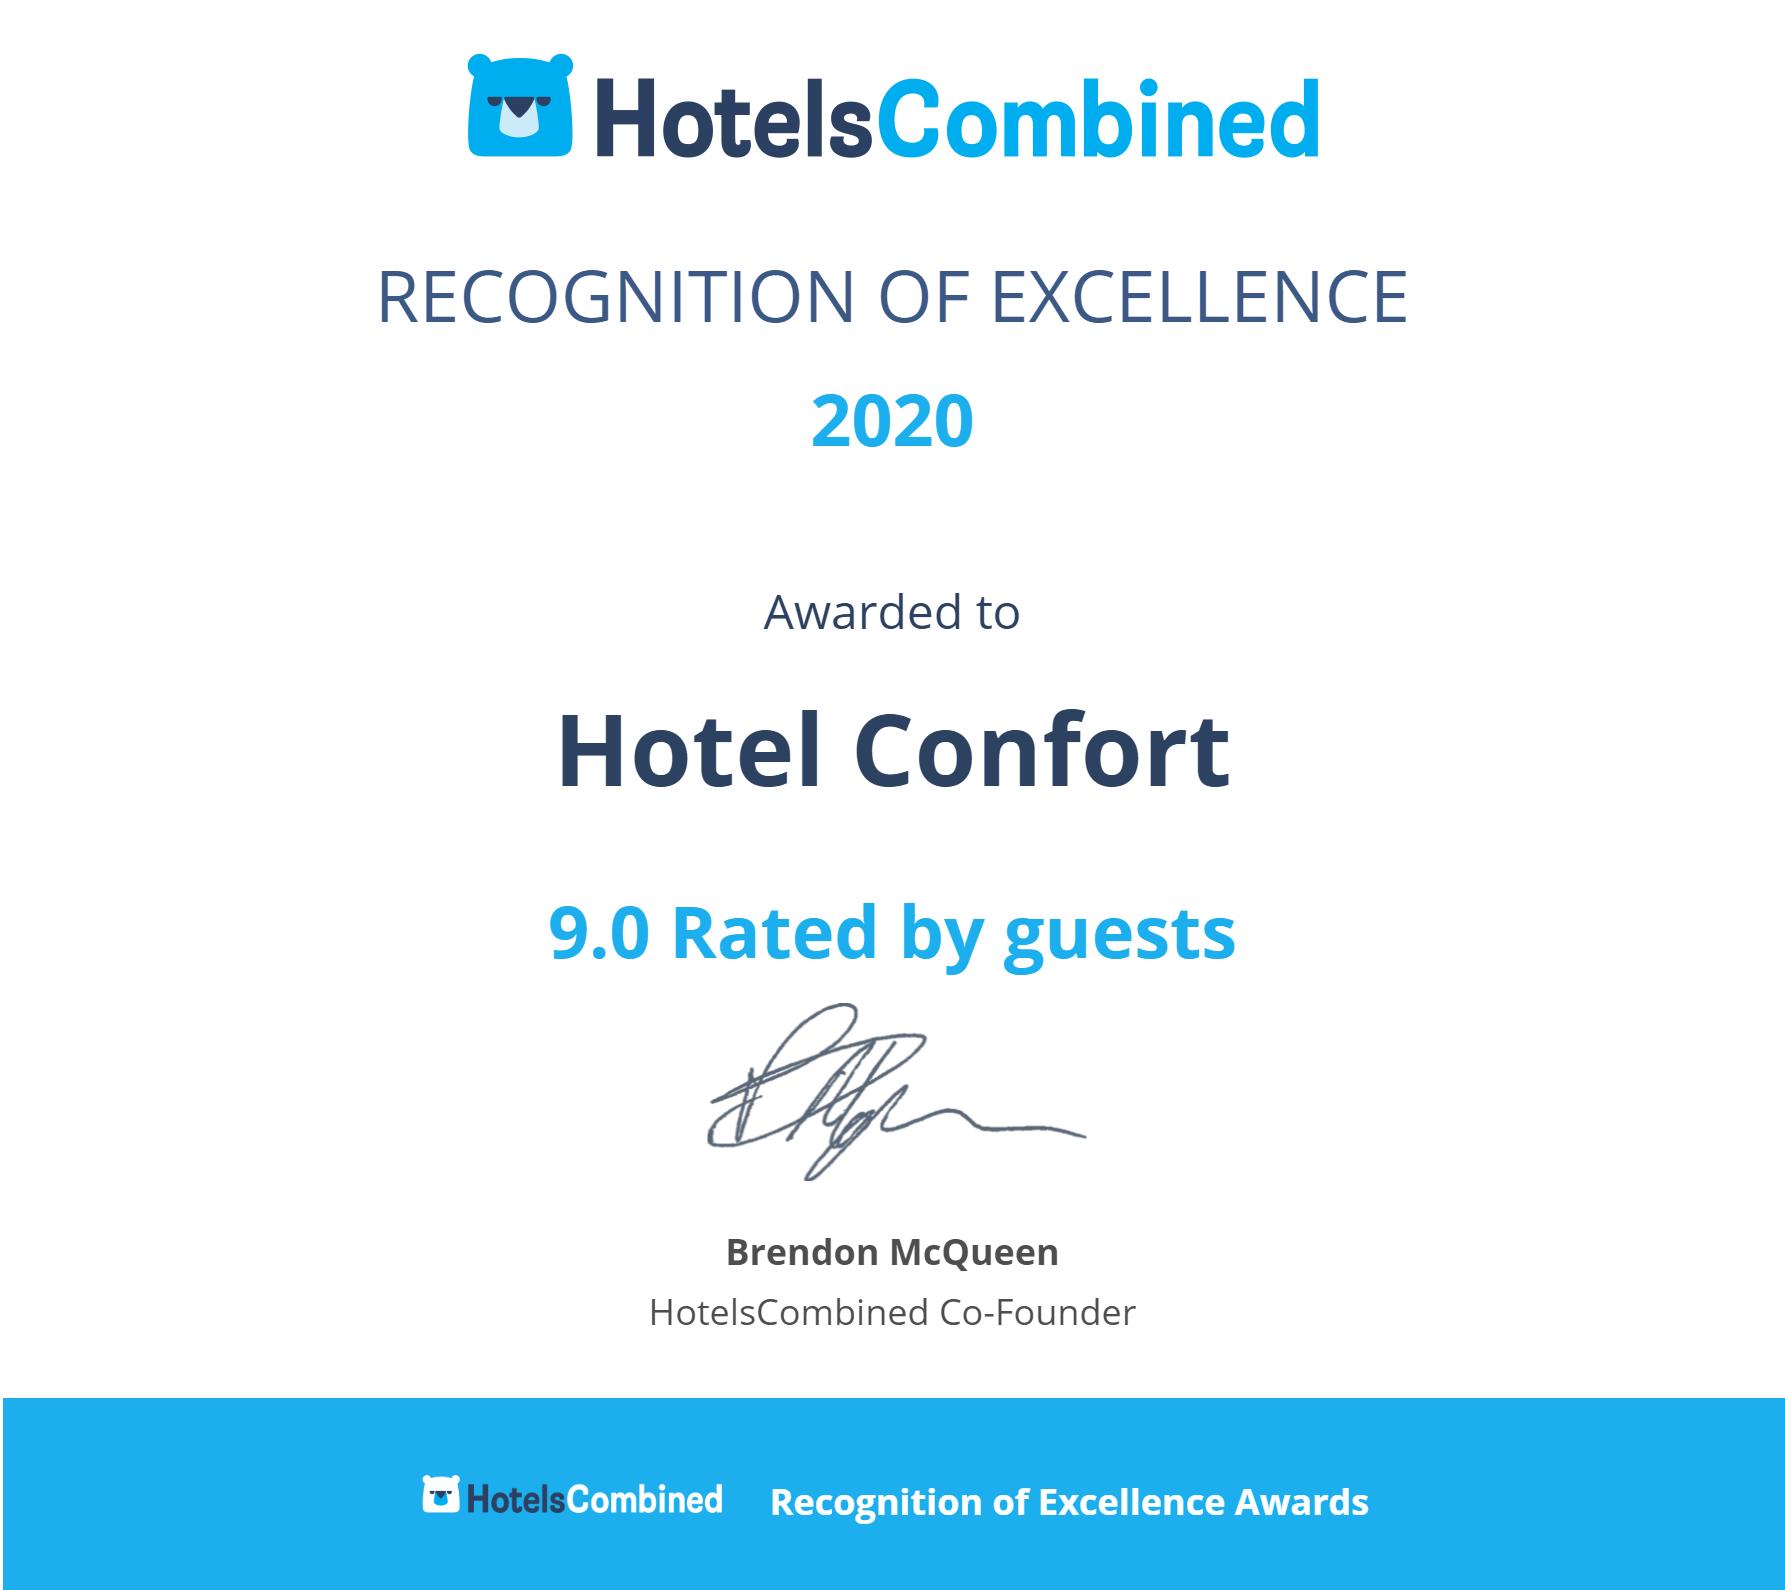 Hotel_Confort_Cluj_Napoca_Certificate-1